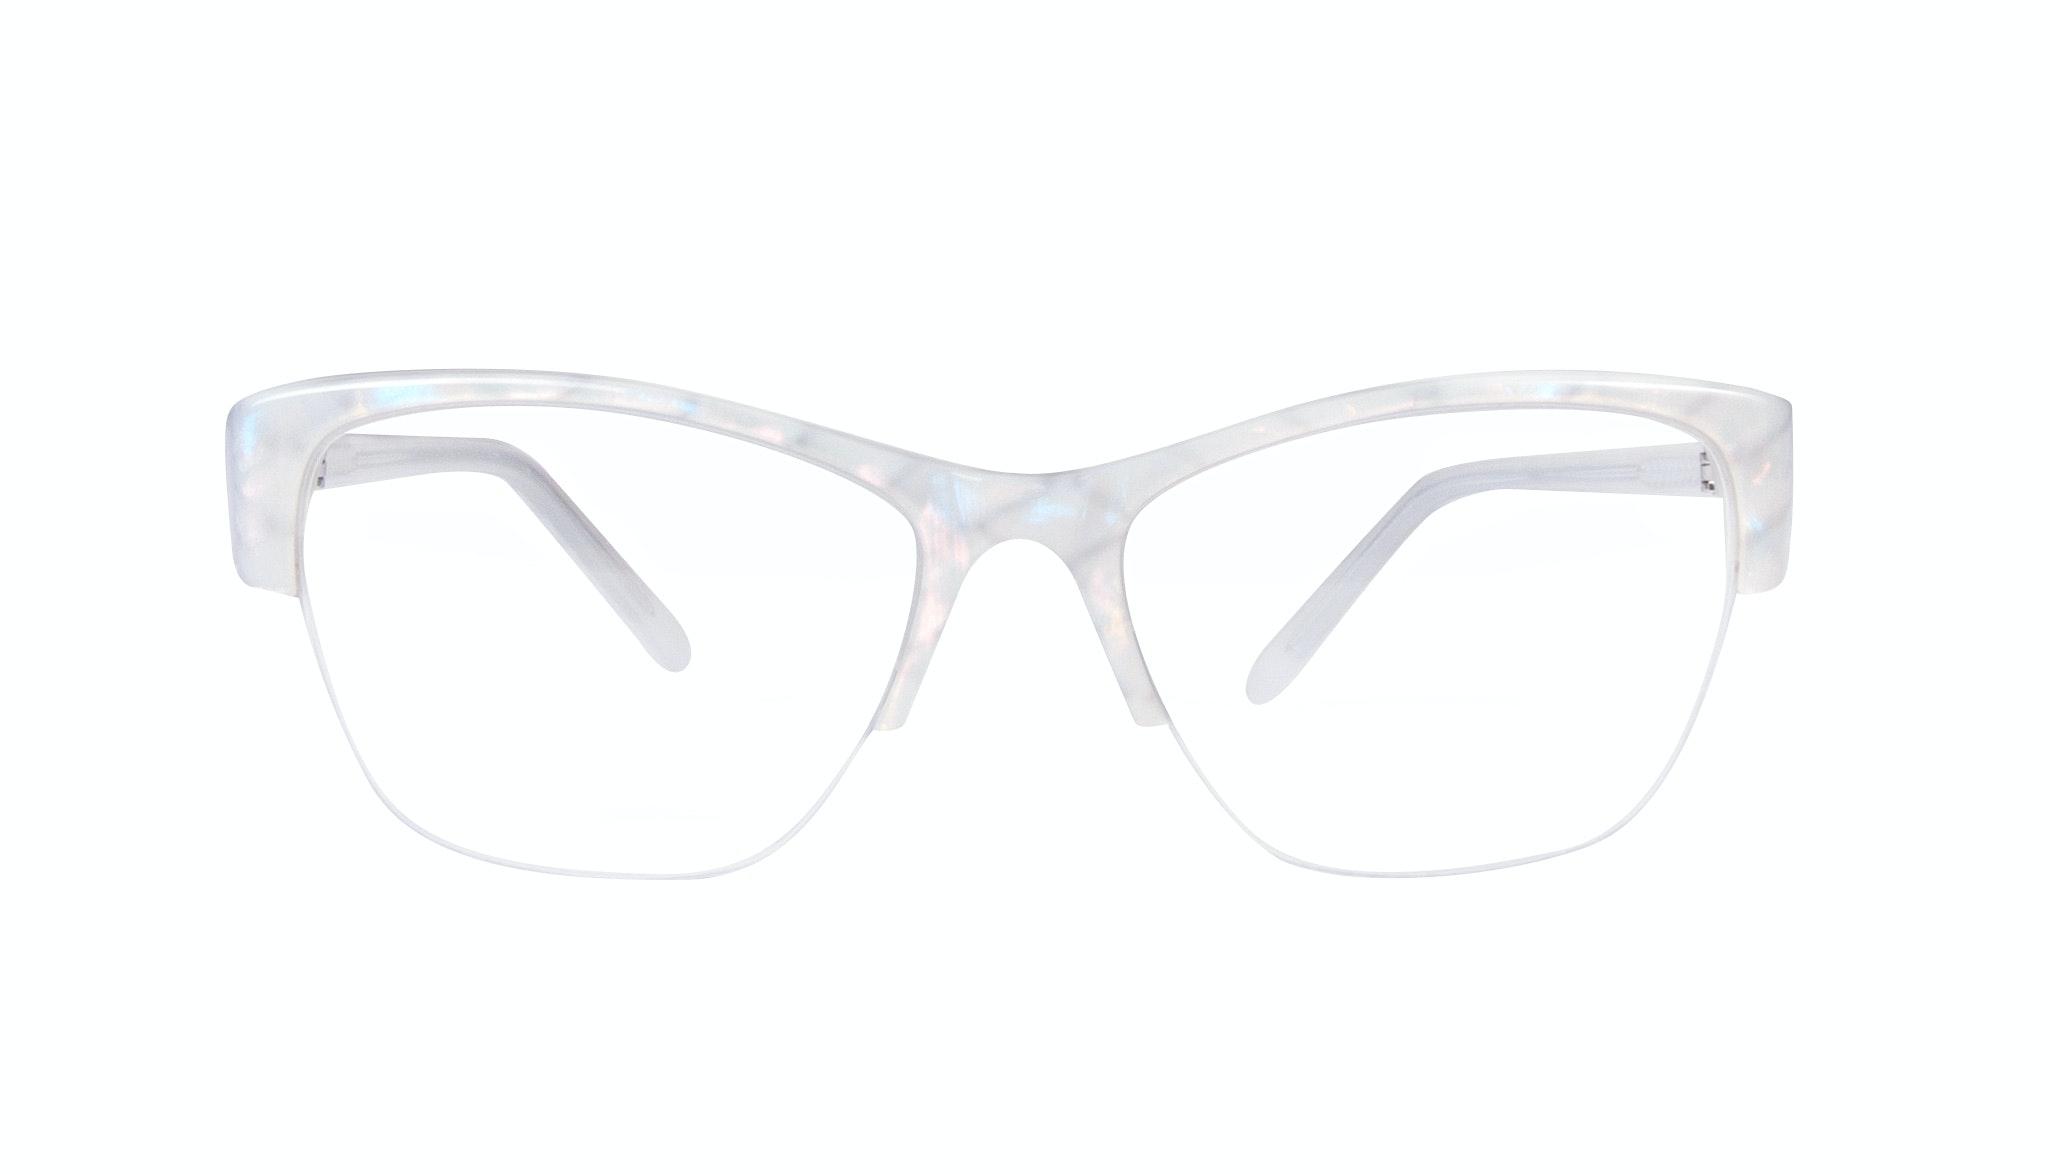 Affordable Fashion Glasses Cat Eye Semi-Rimless Eyeglasses Women Myrtle Light Opaline